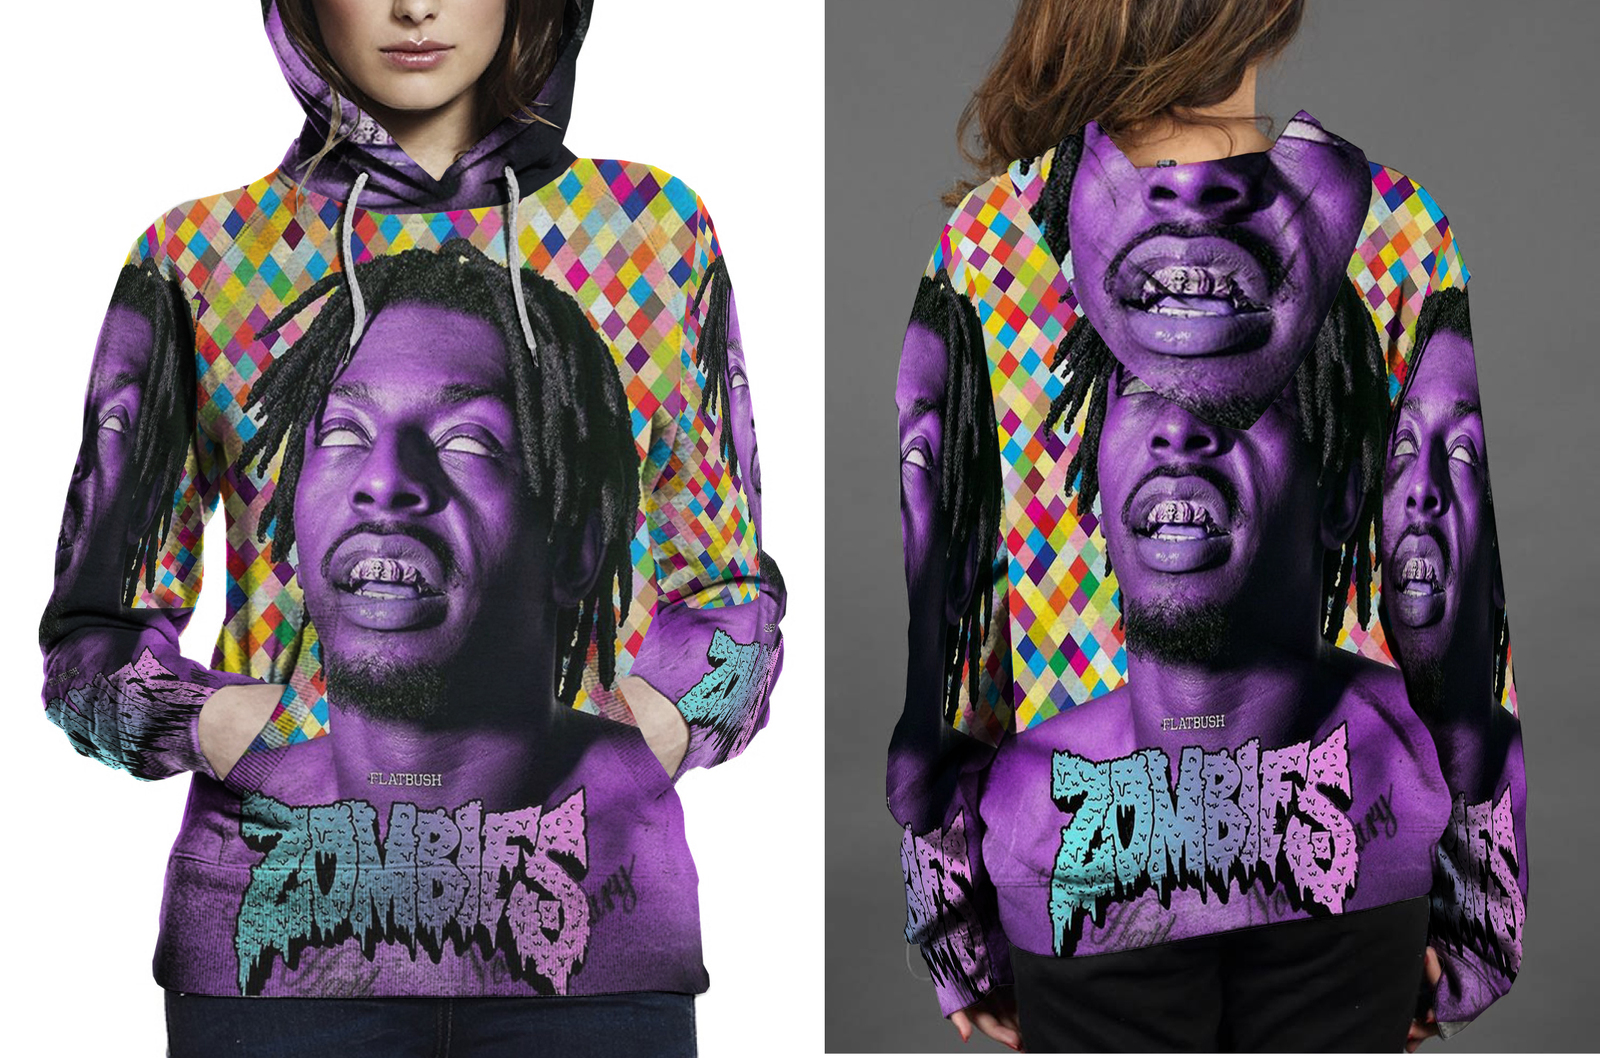 Flatbush zombies hoodie  fullprint for women